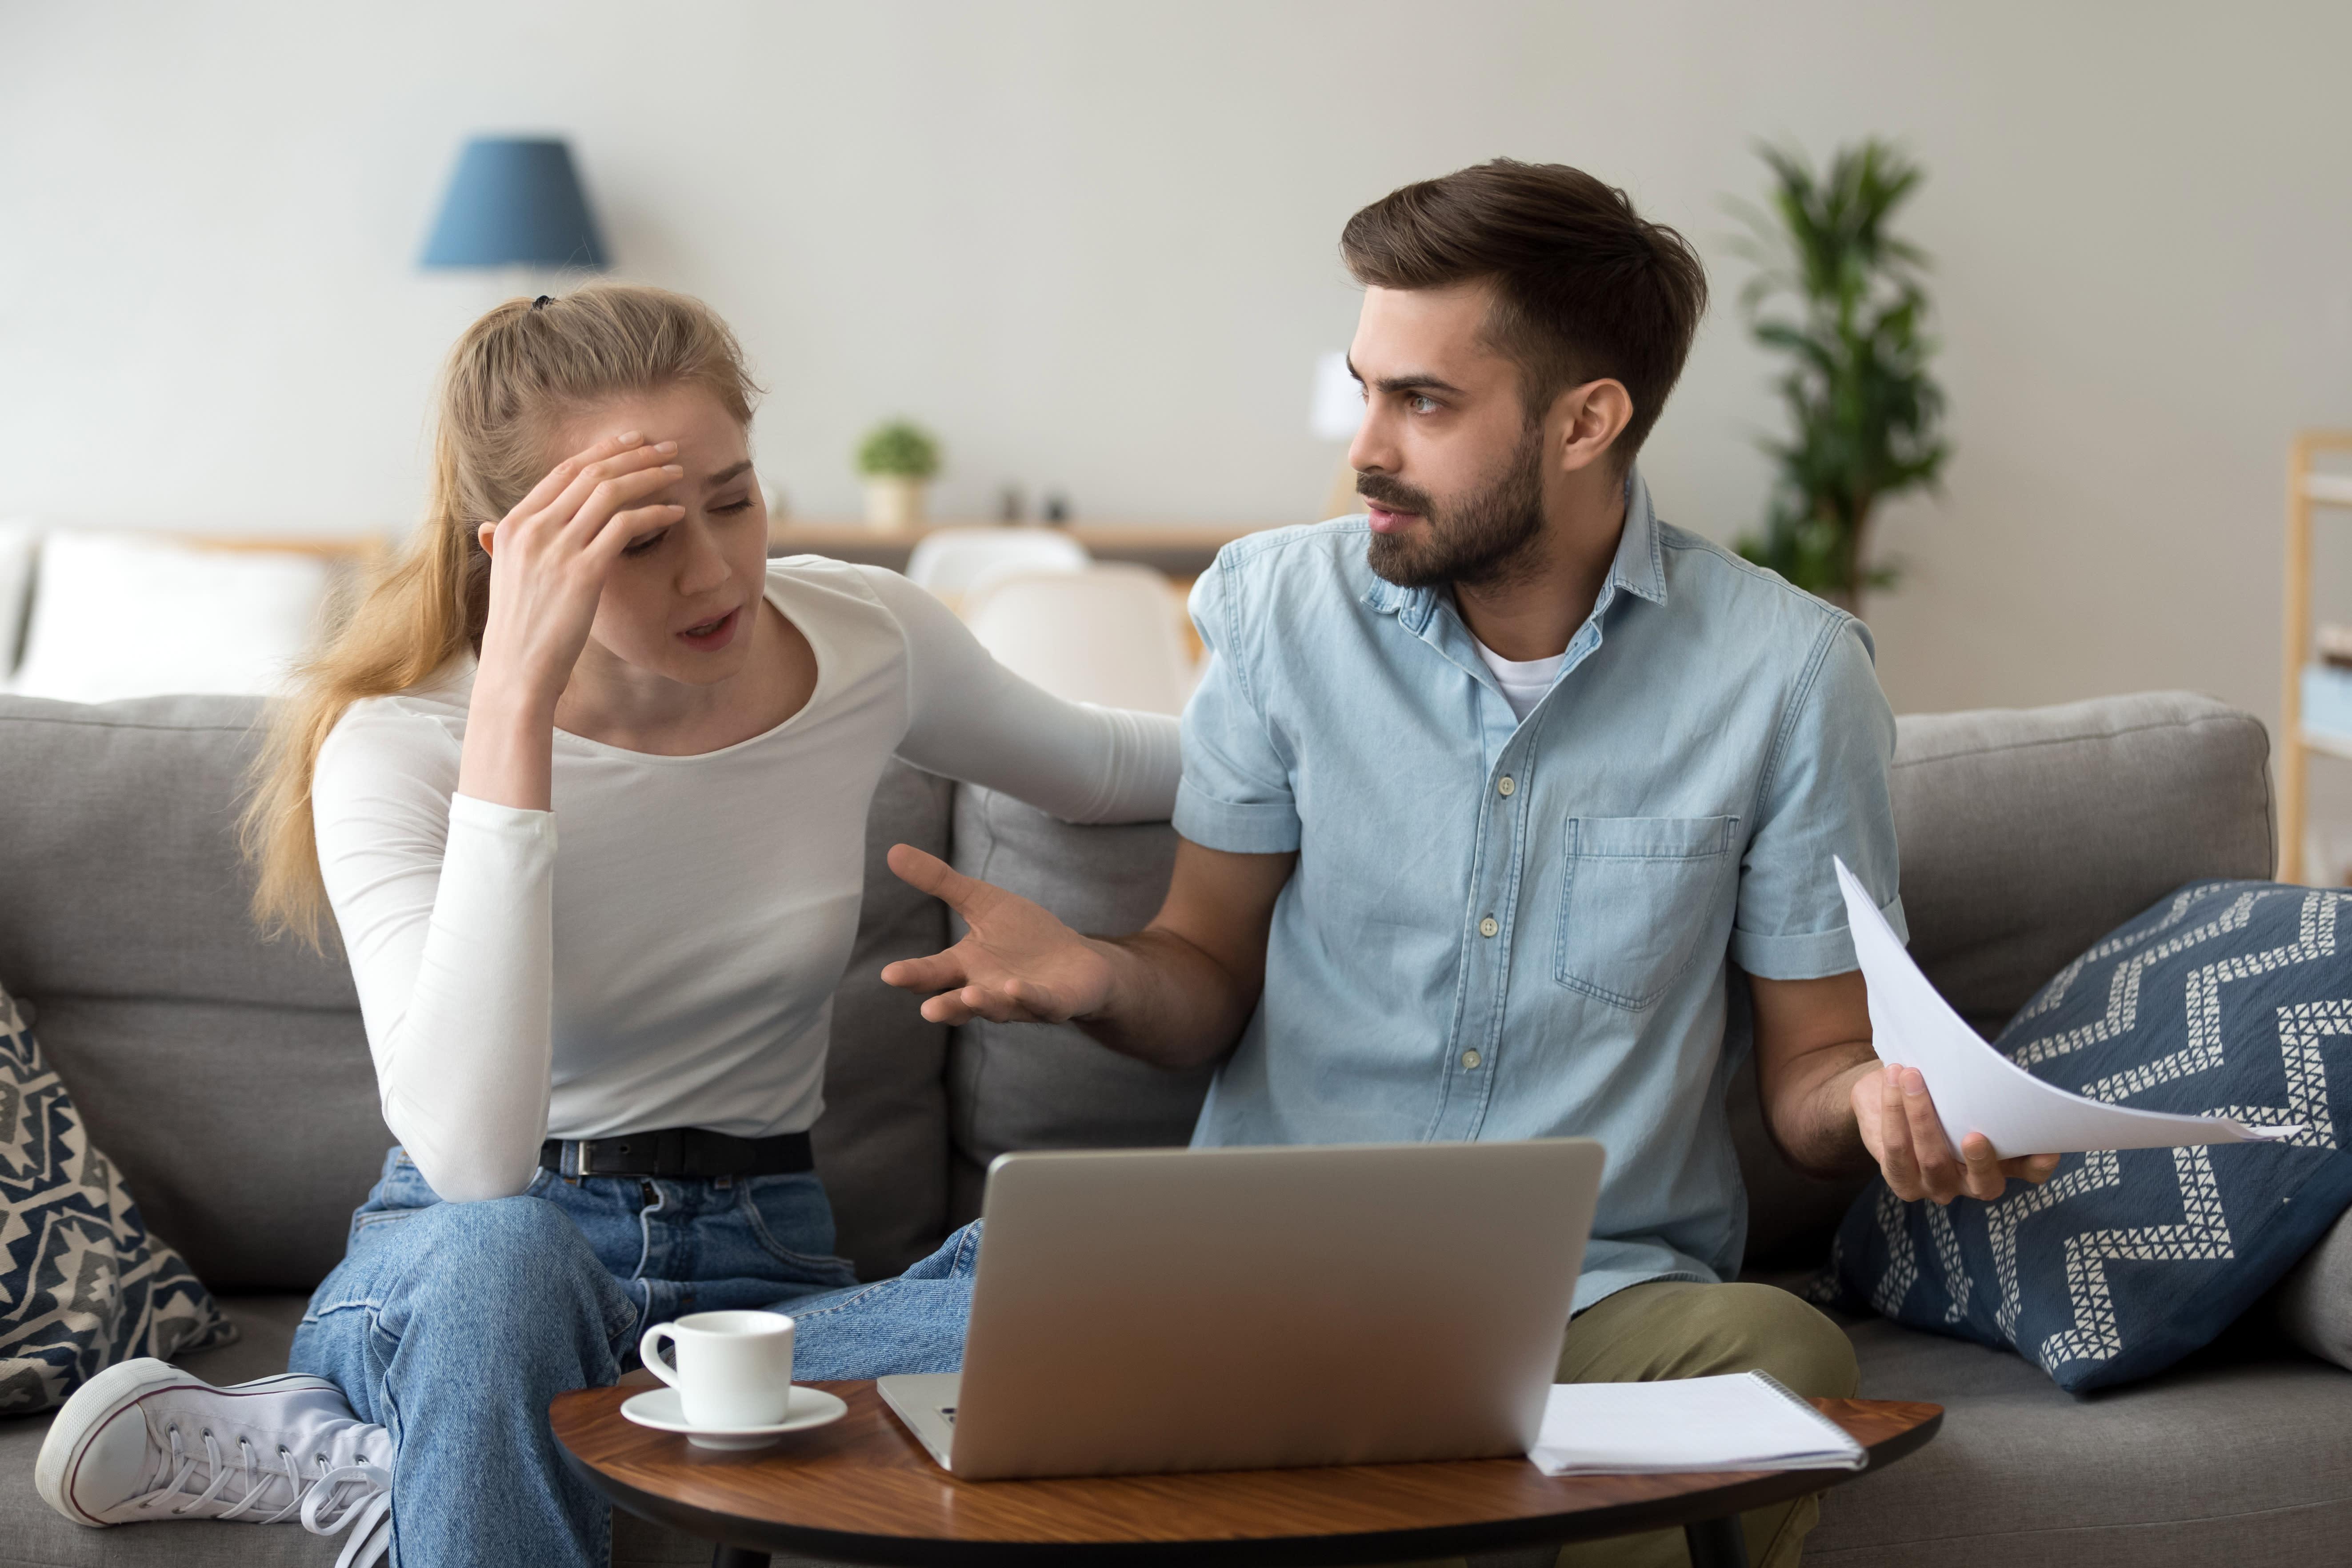 Coronavirus lockdown: How to avoid a break-up and make